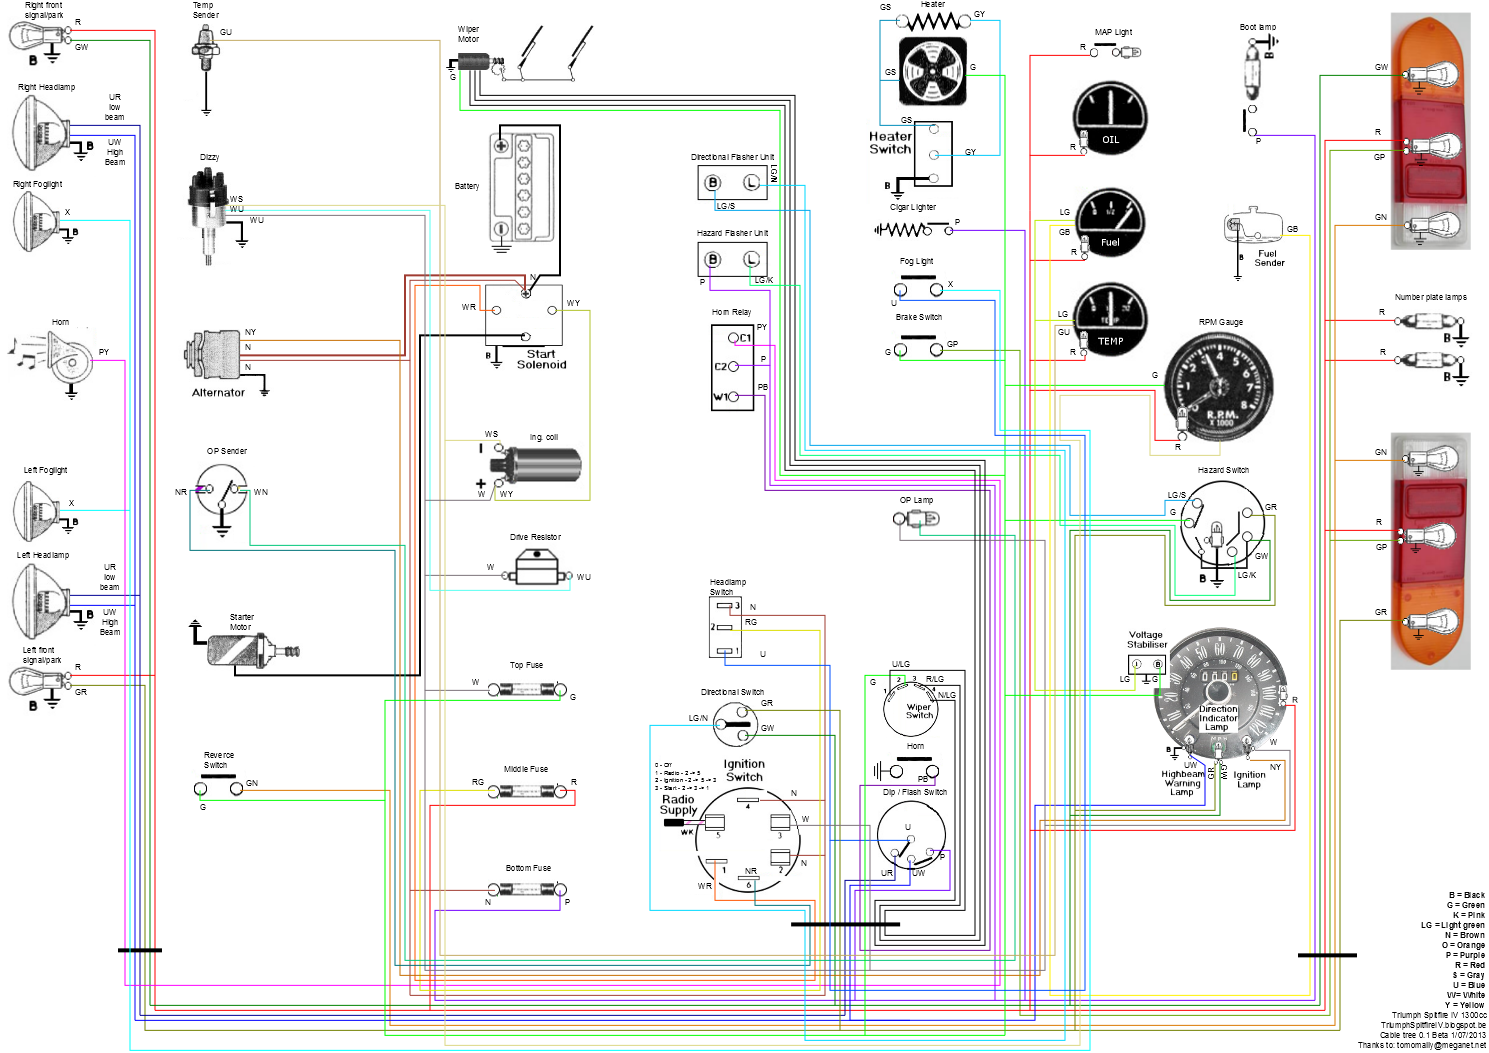 spitfire 1500 wire harness diagram wiring diagram expert 1980 spitfire wiring diagram wiring diagram paper spitfire [ 1489 x 1053 Pixel ]